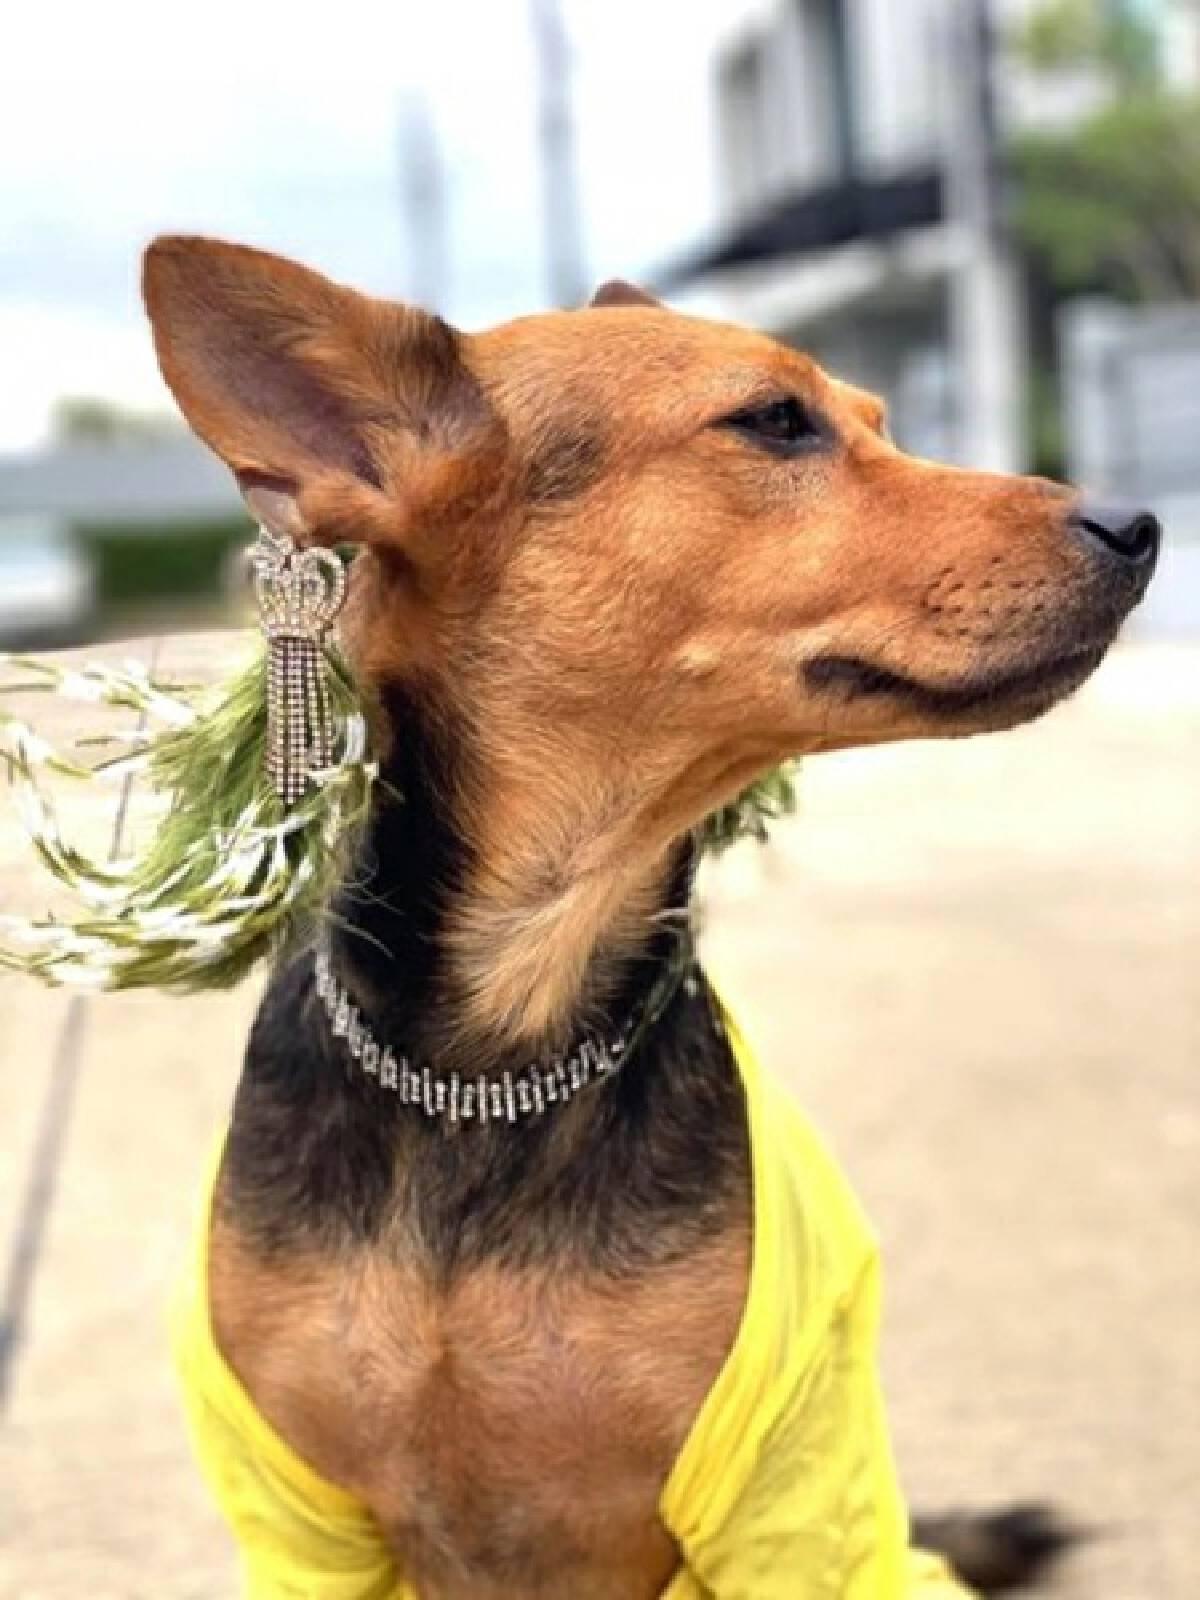 Diamonds are a dog's best friend